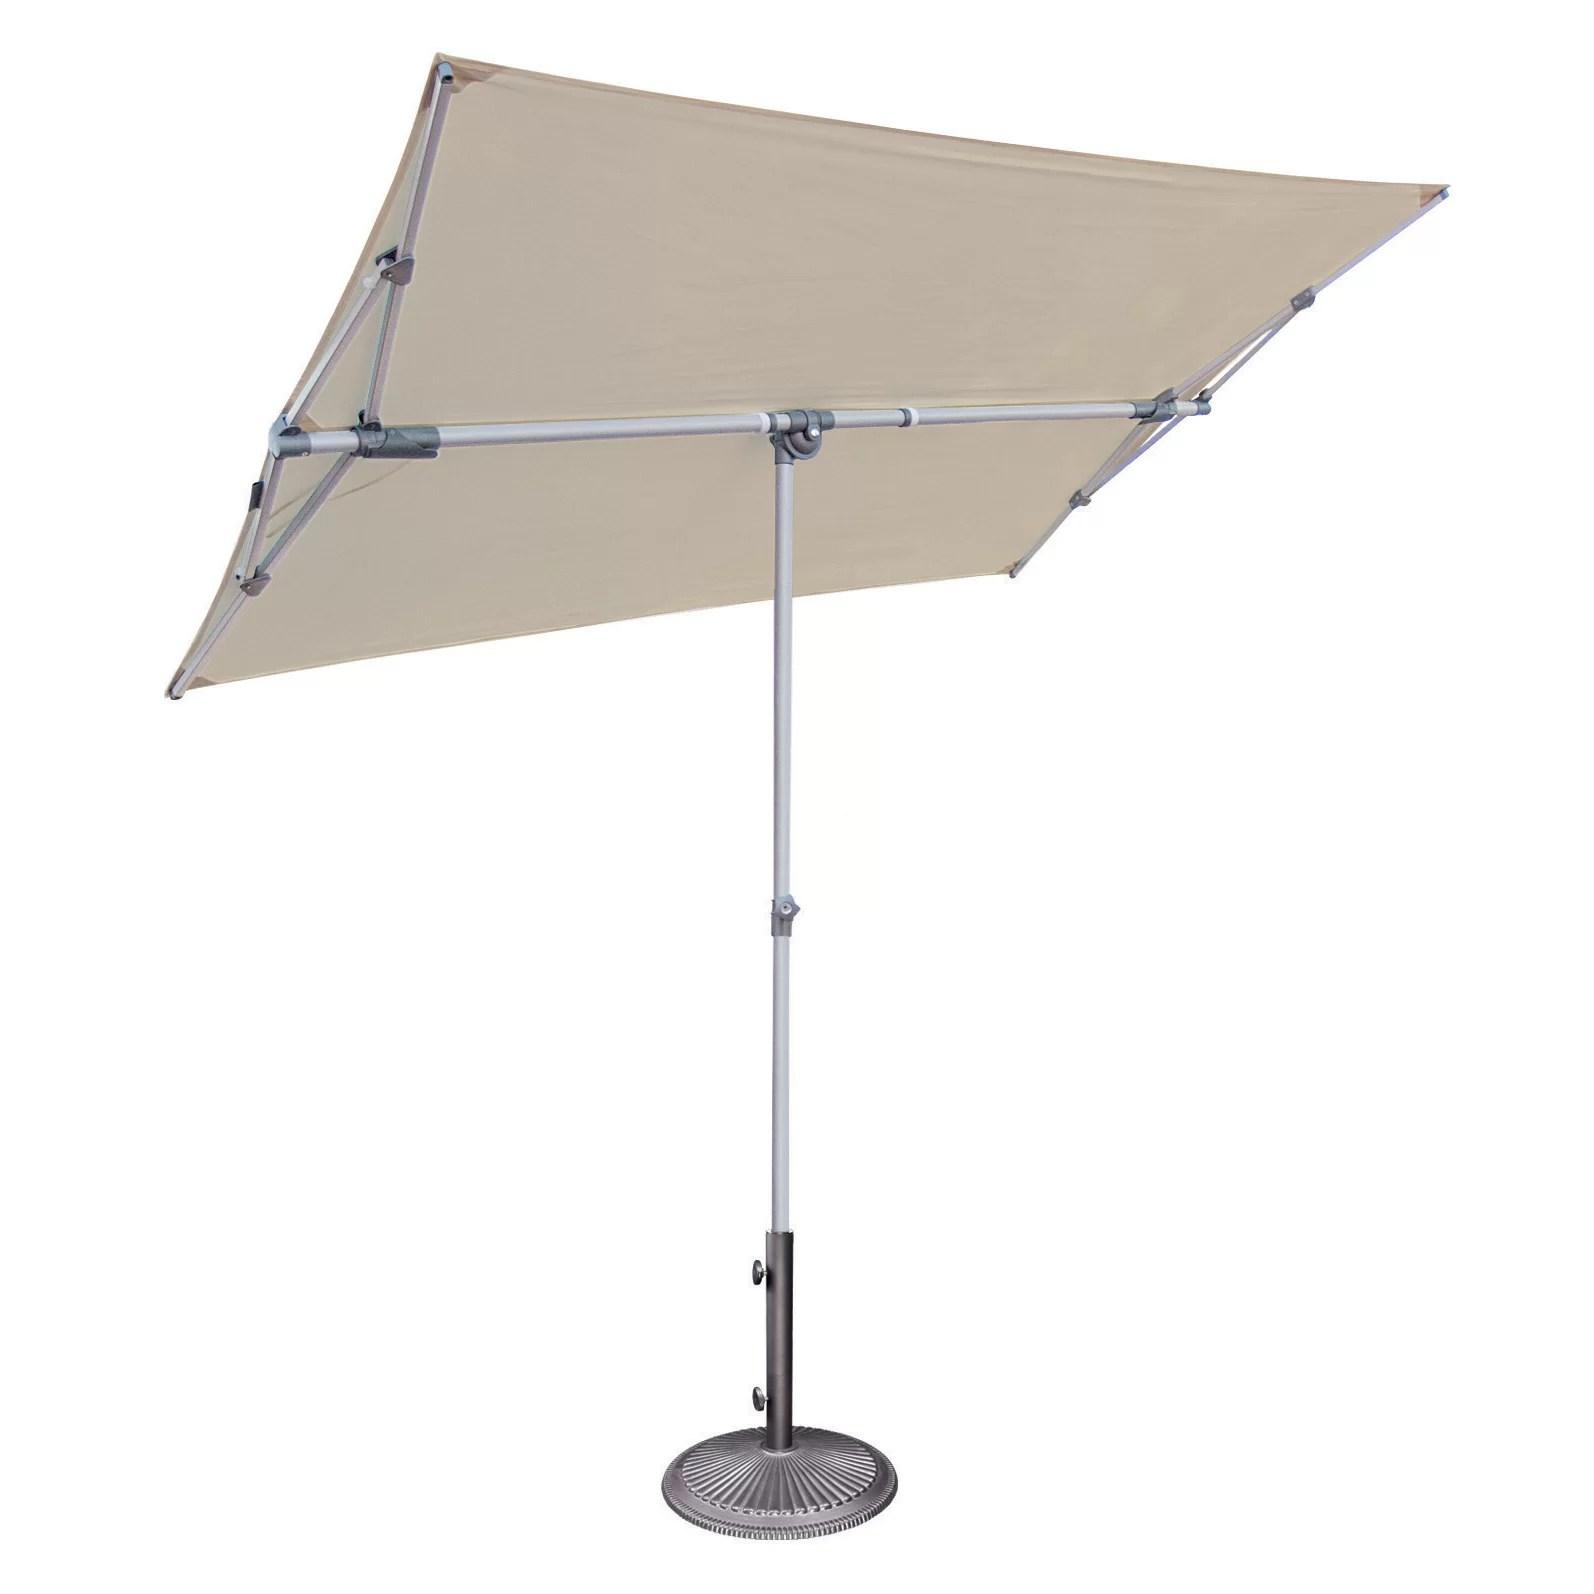 SimplyShade 5' x 7' Rectangular Market Umbrella & Reviews